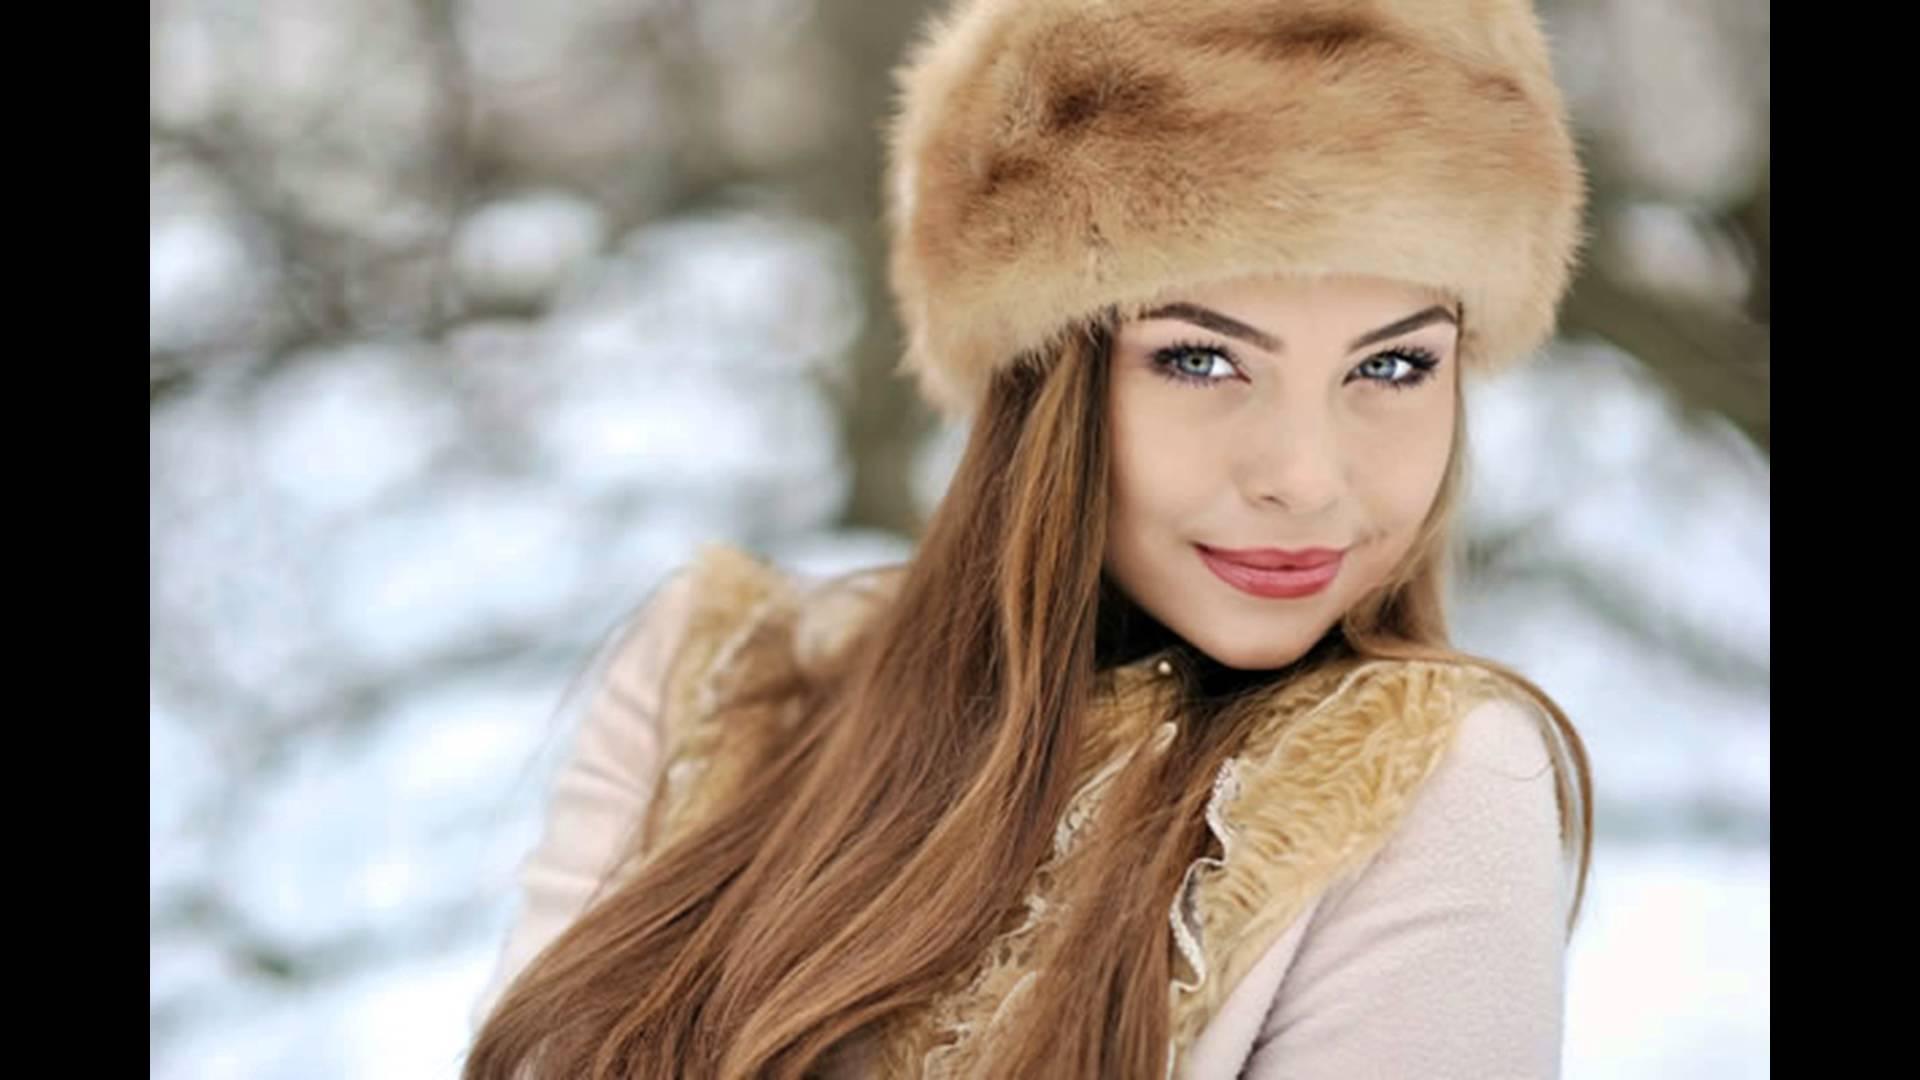 بالصور بنات روسيا , صور لجميلات روسيا 3491 4